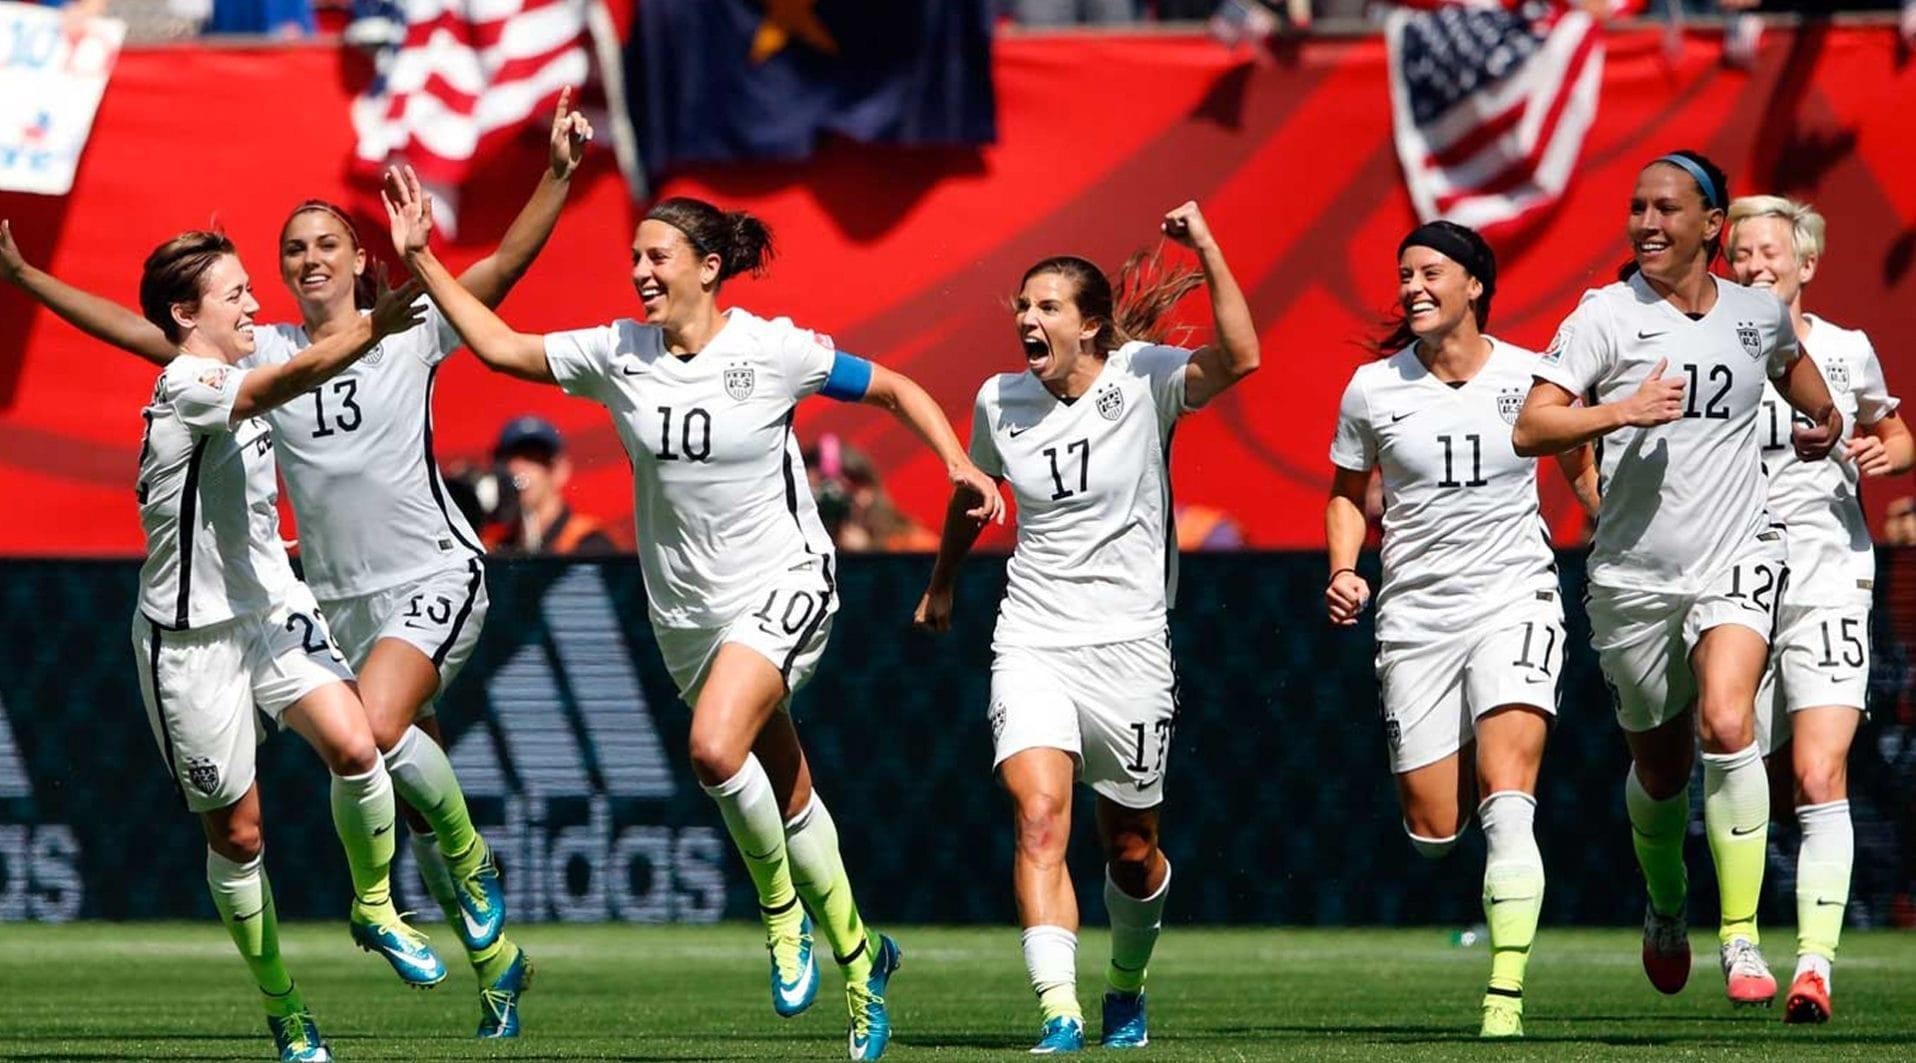 Women's World Cup 2019